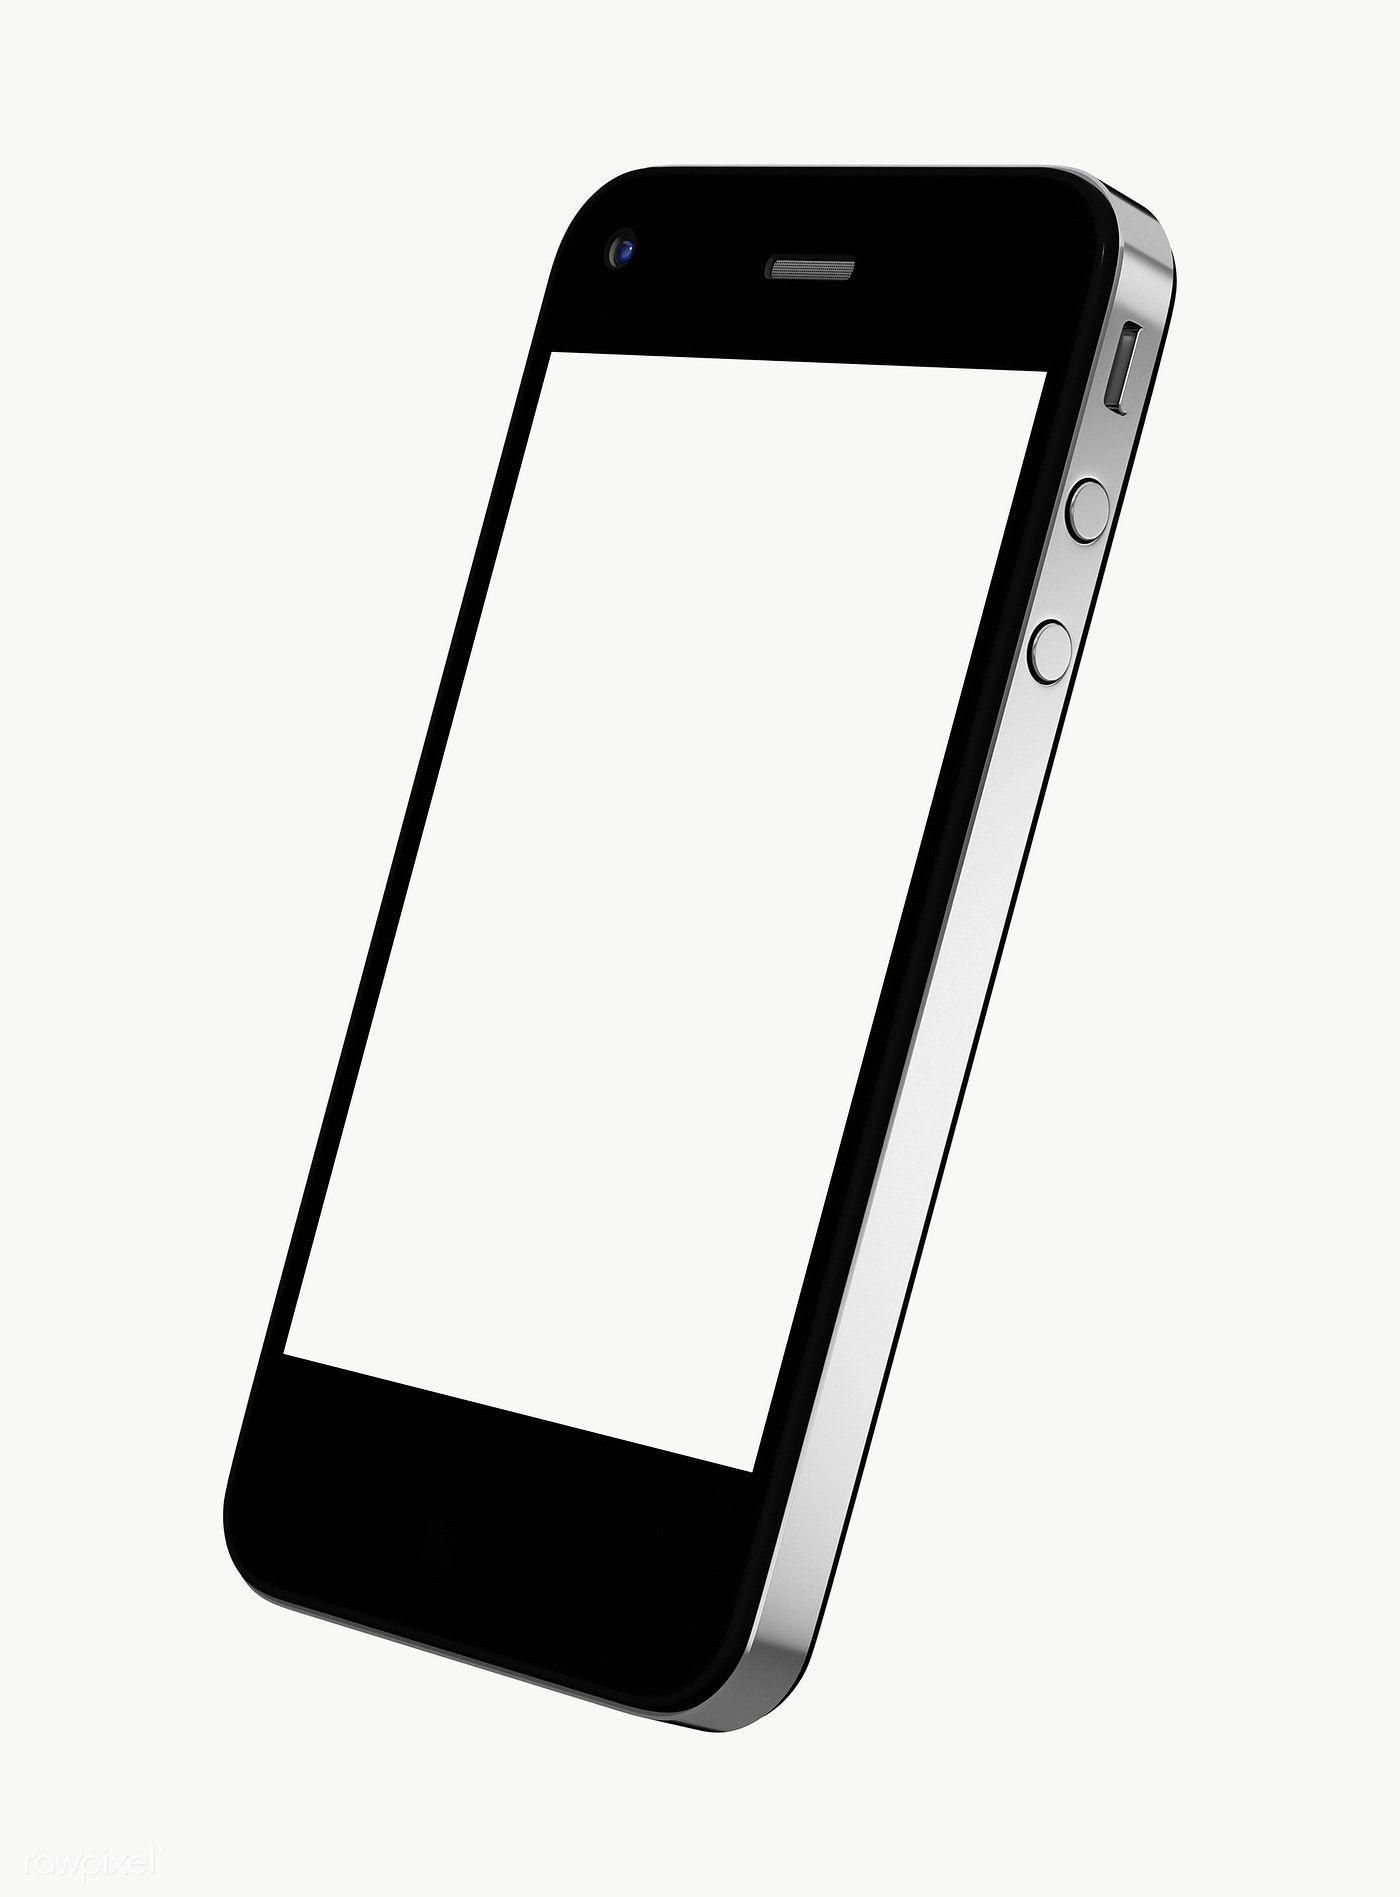 Download premium png of Three dimensional image of mobile